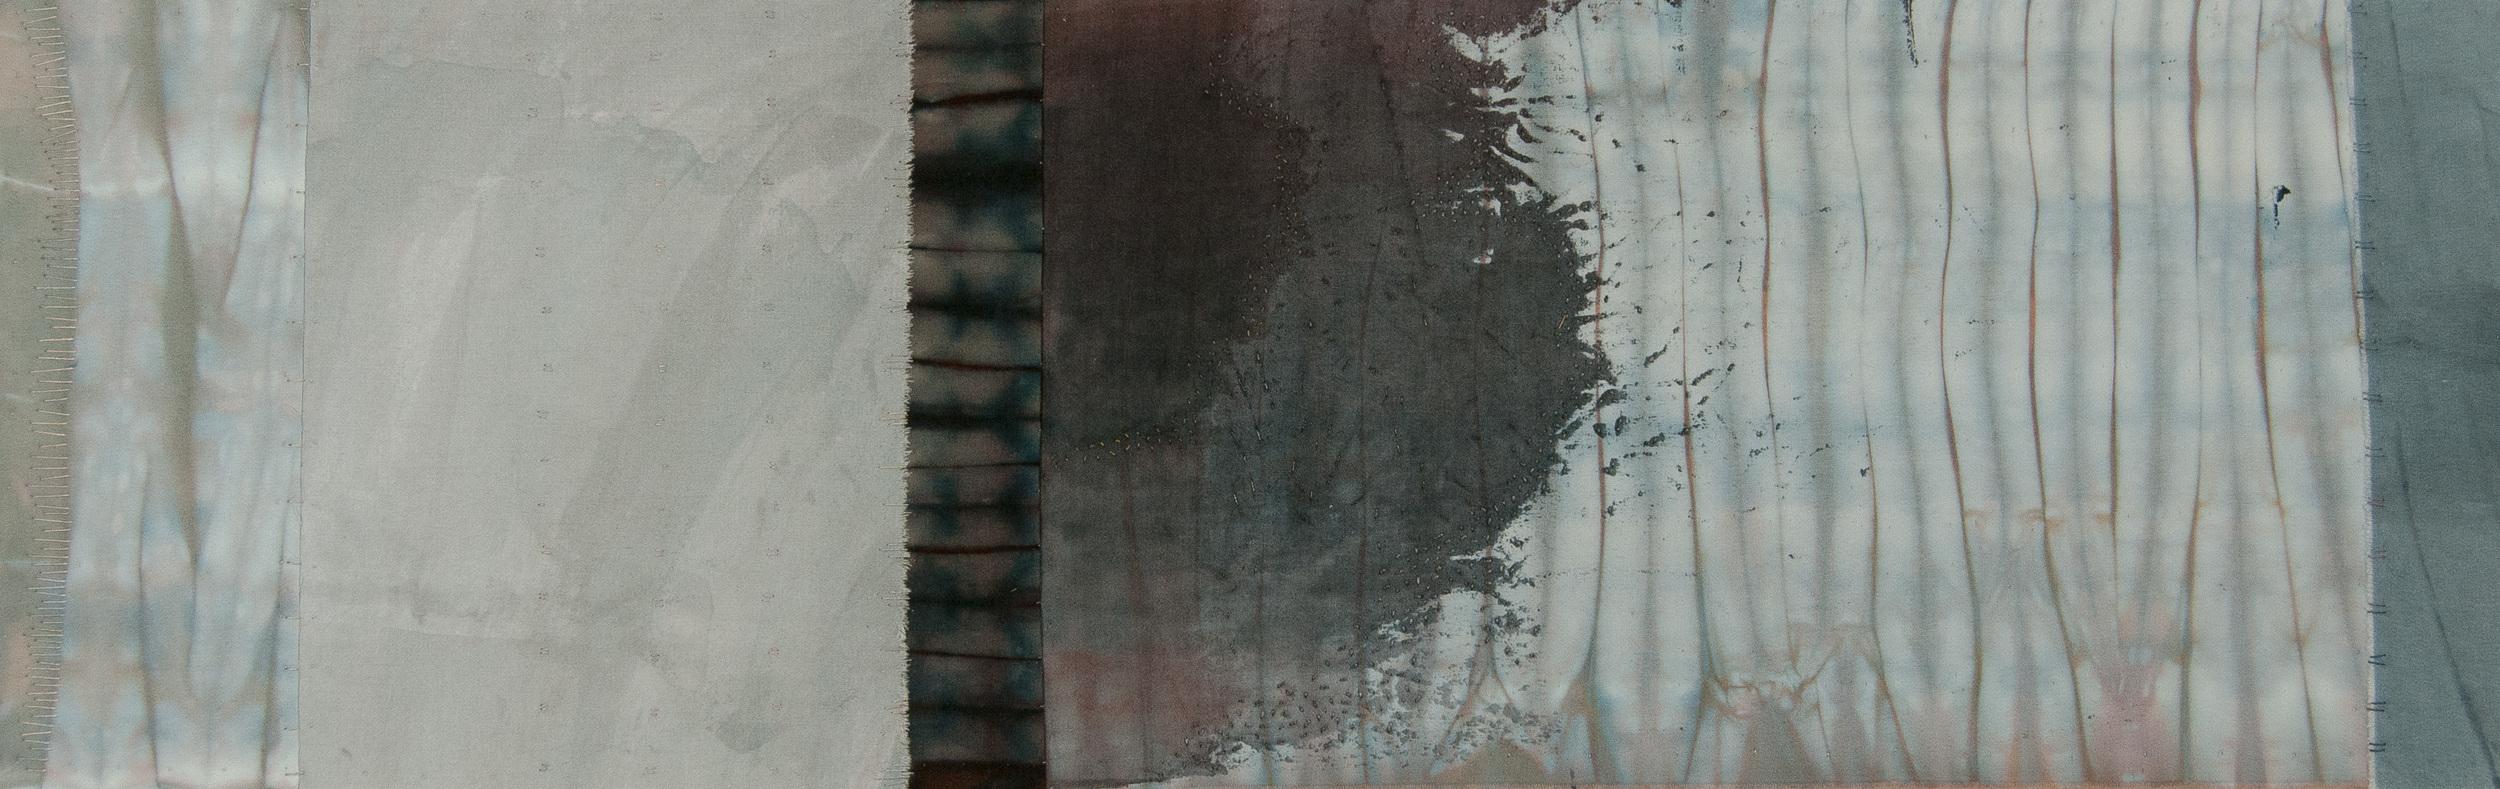 Transient 2015 Helen Terry